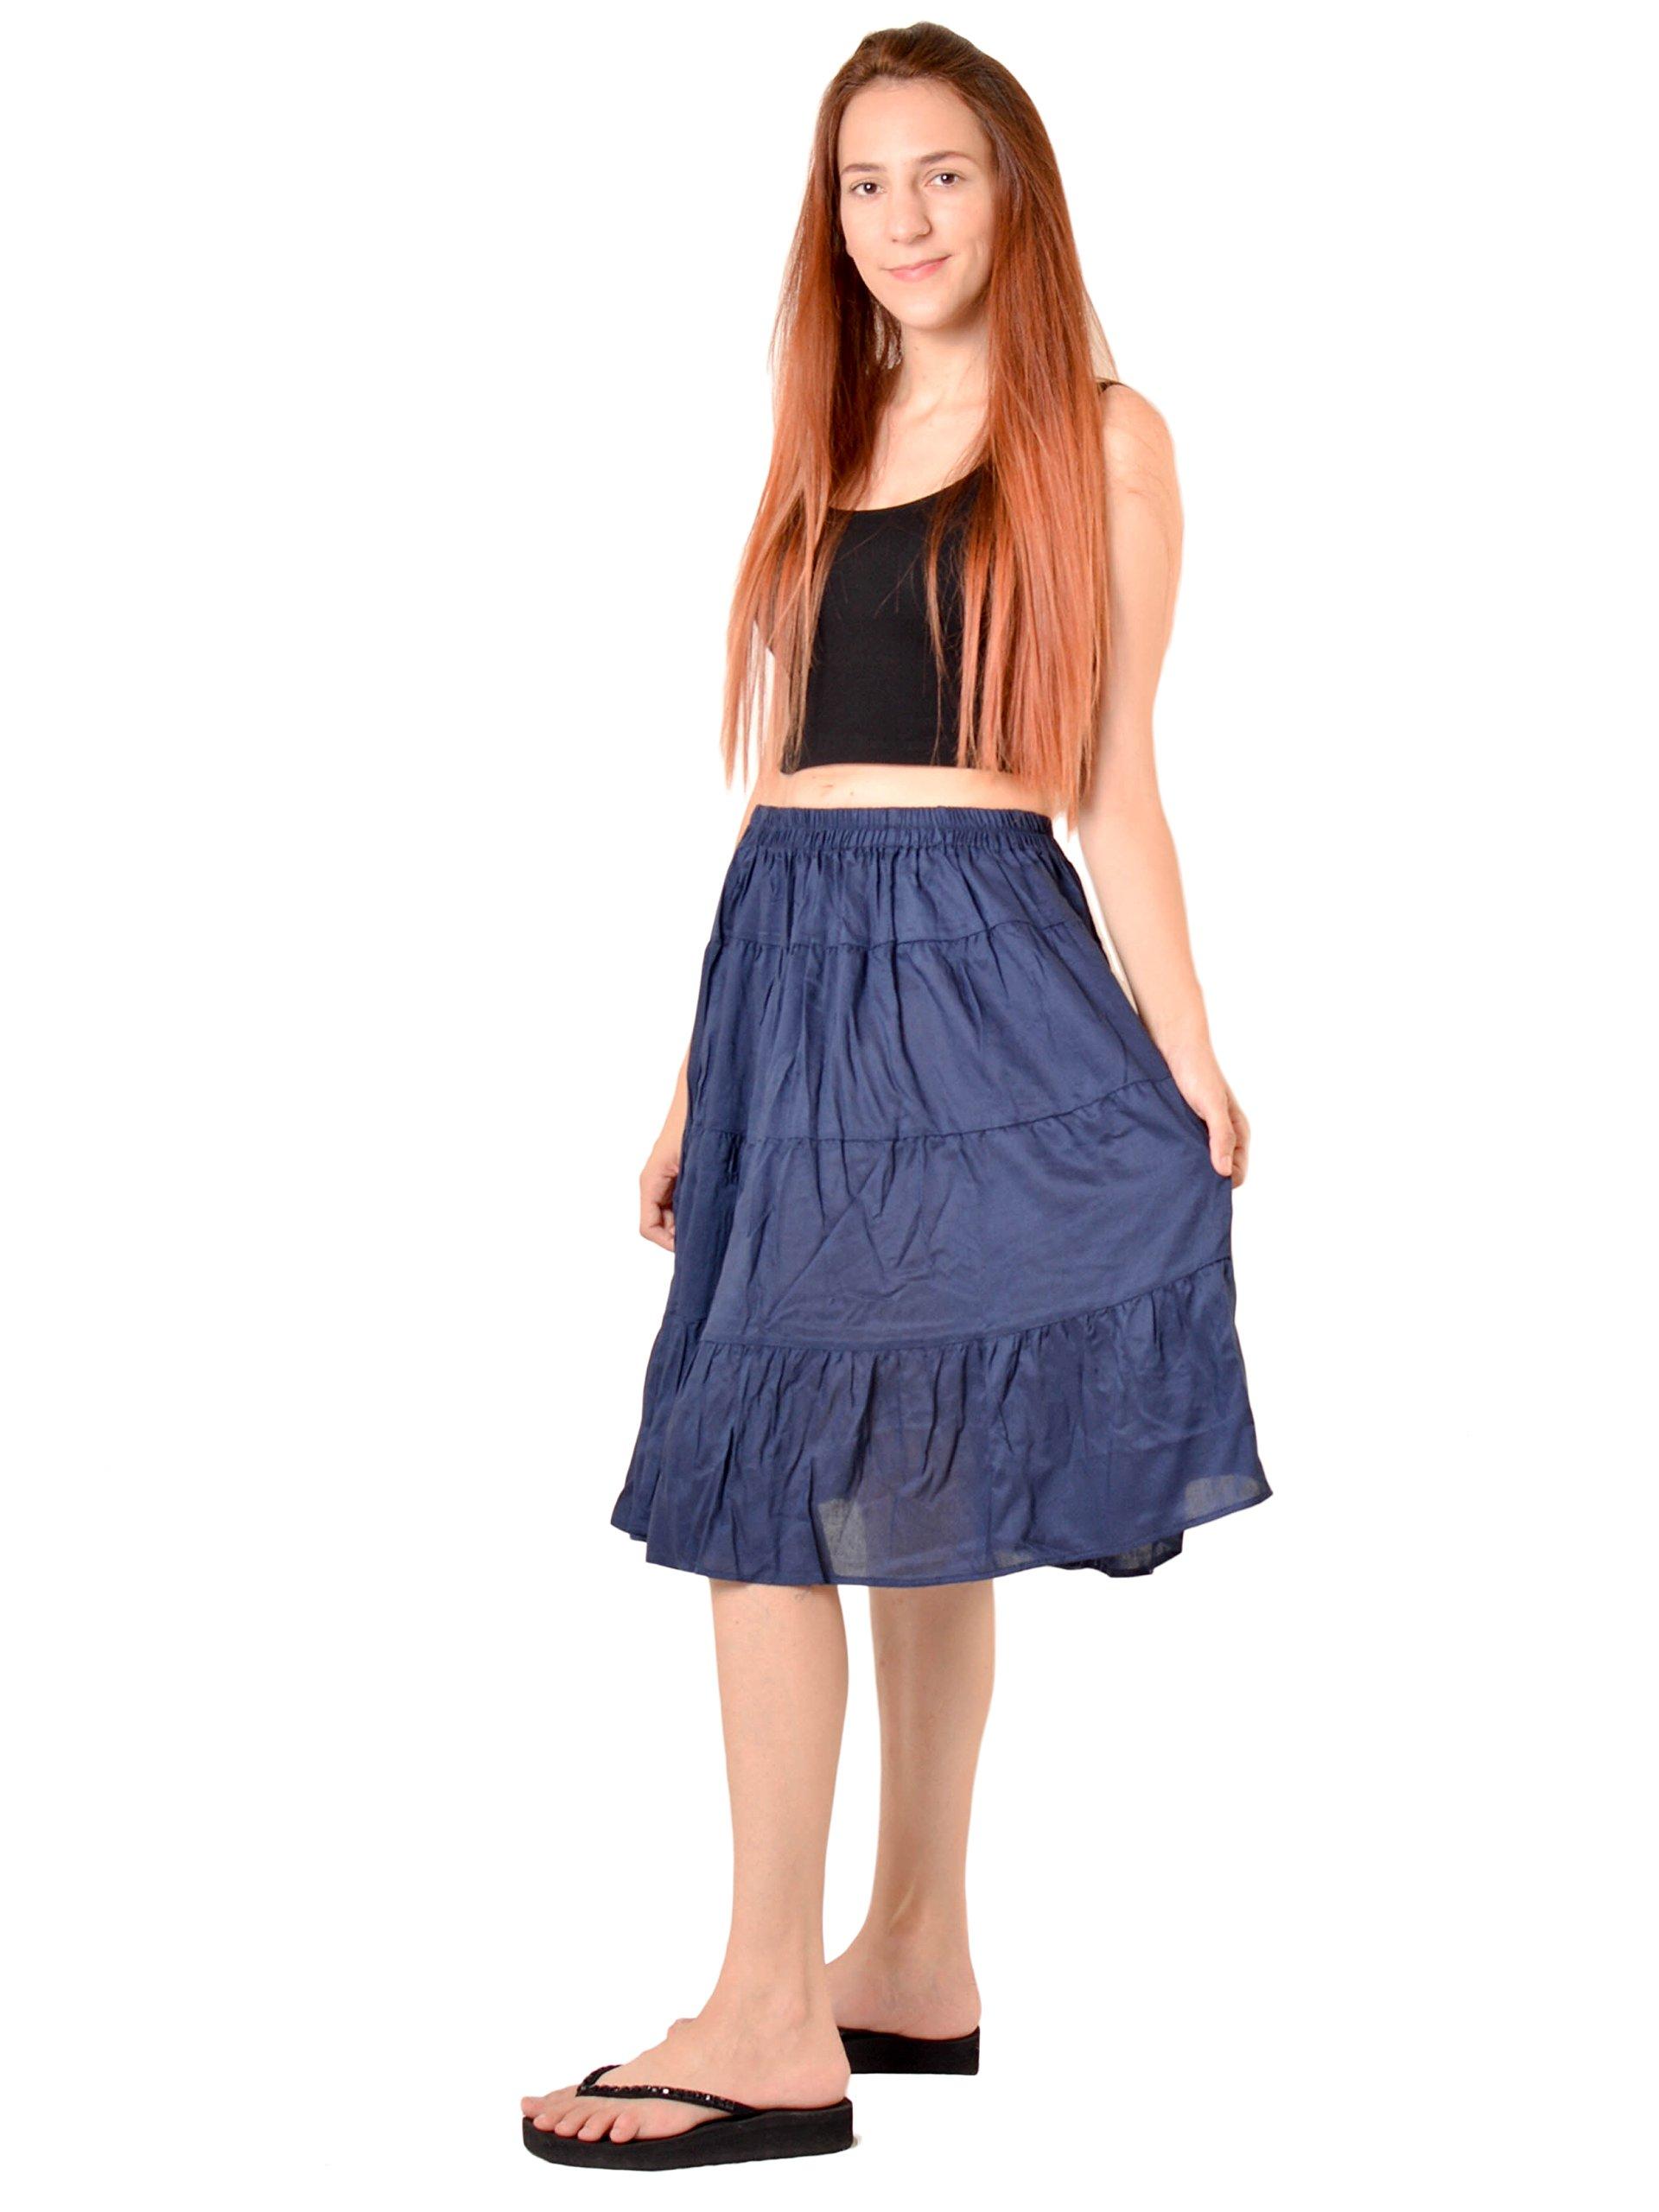 Orient Trail Women's Hippie Bohemian Boho Knee Length Skirt Medium Dark Blue by Orient Trail (Image #3)